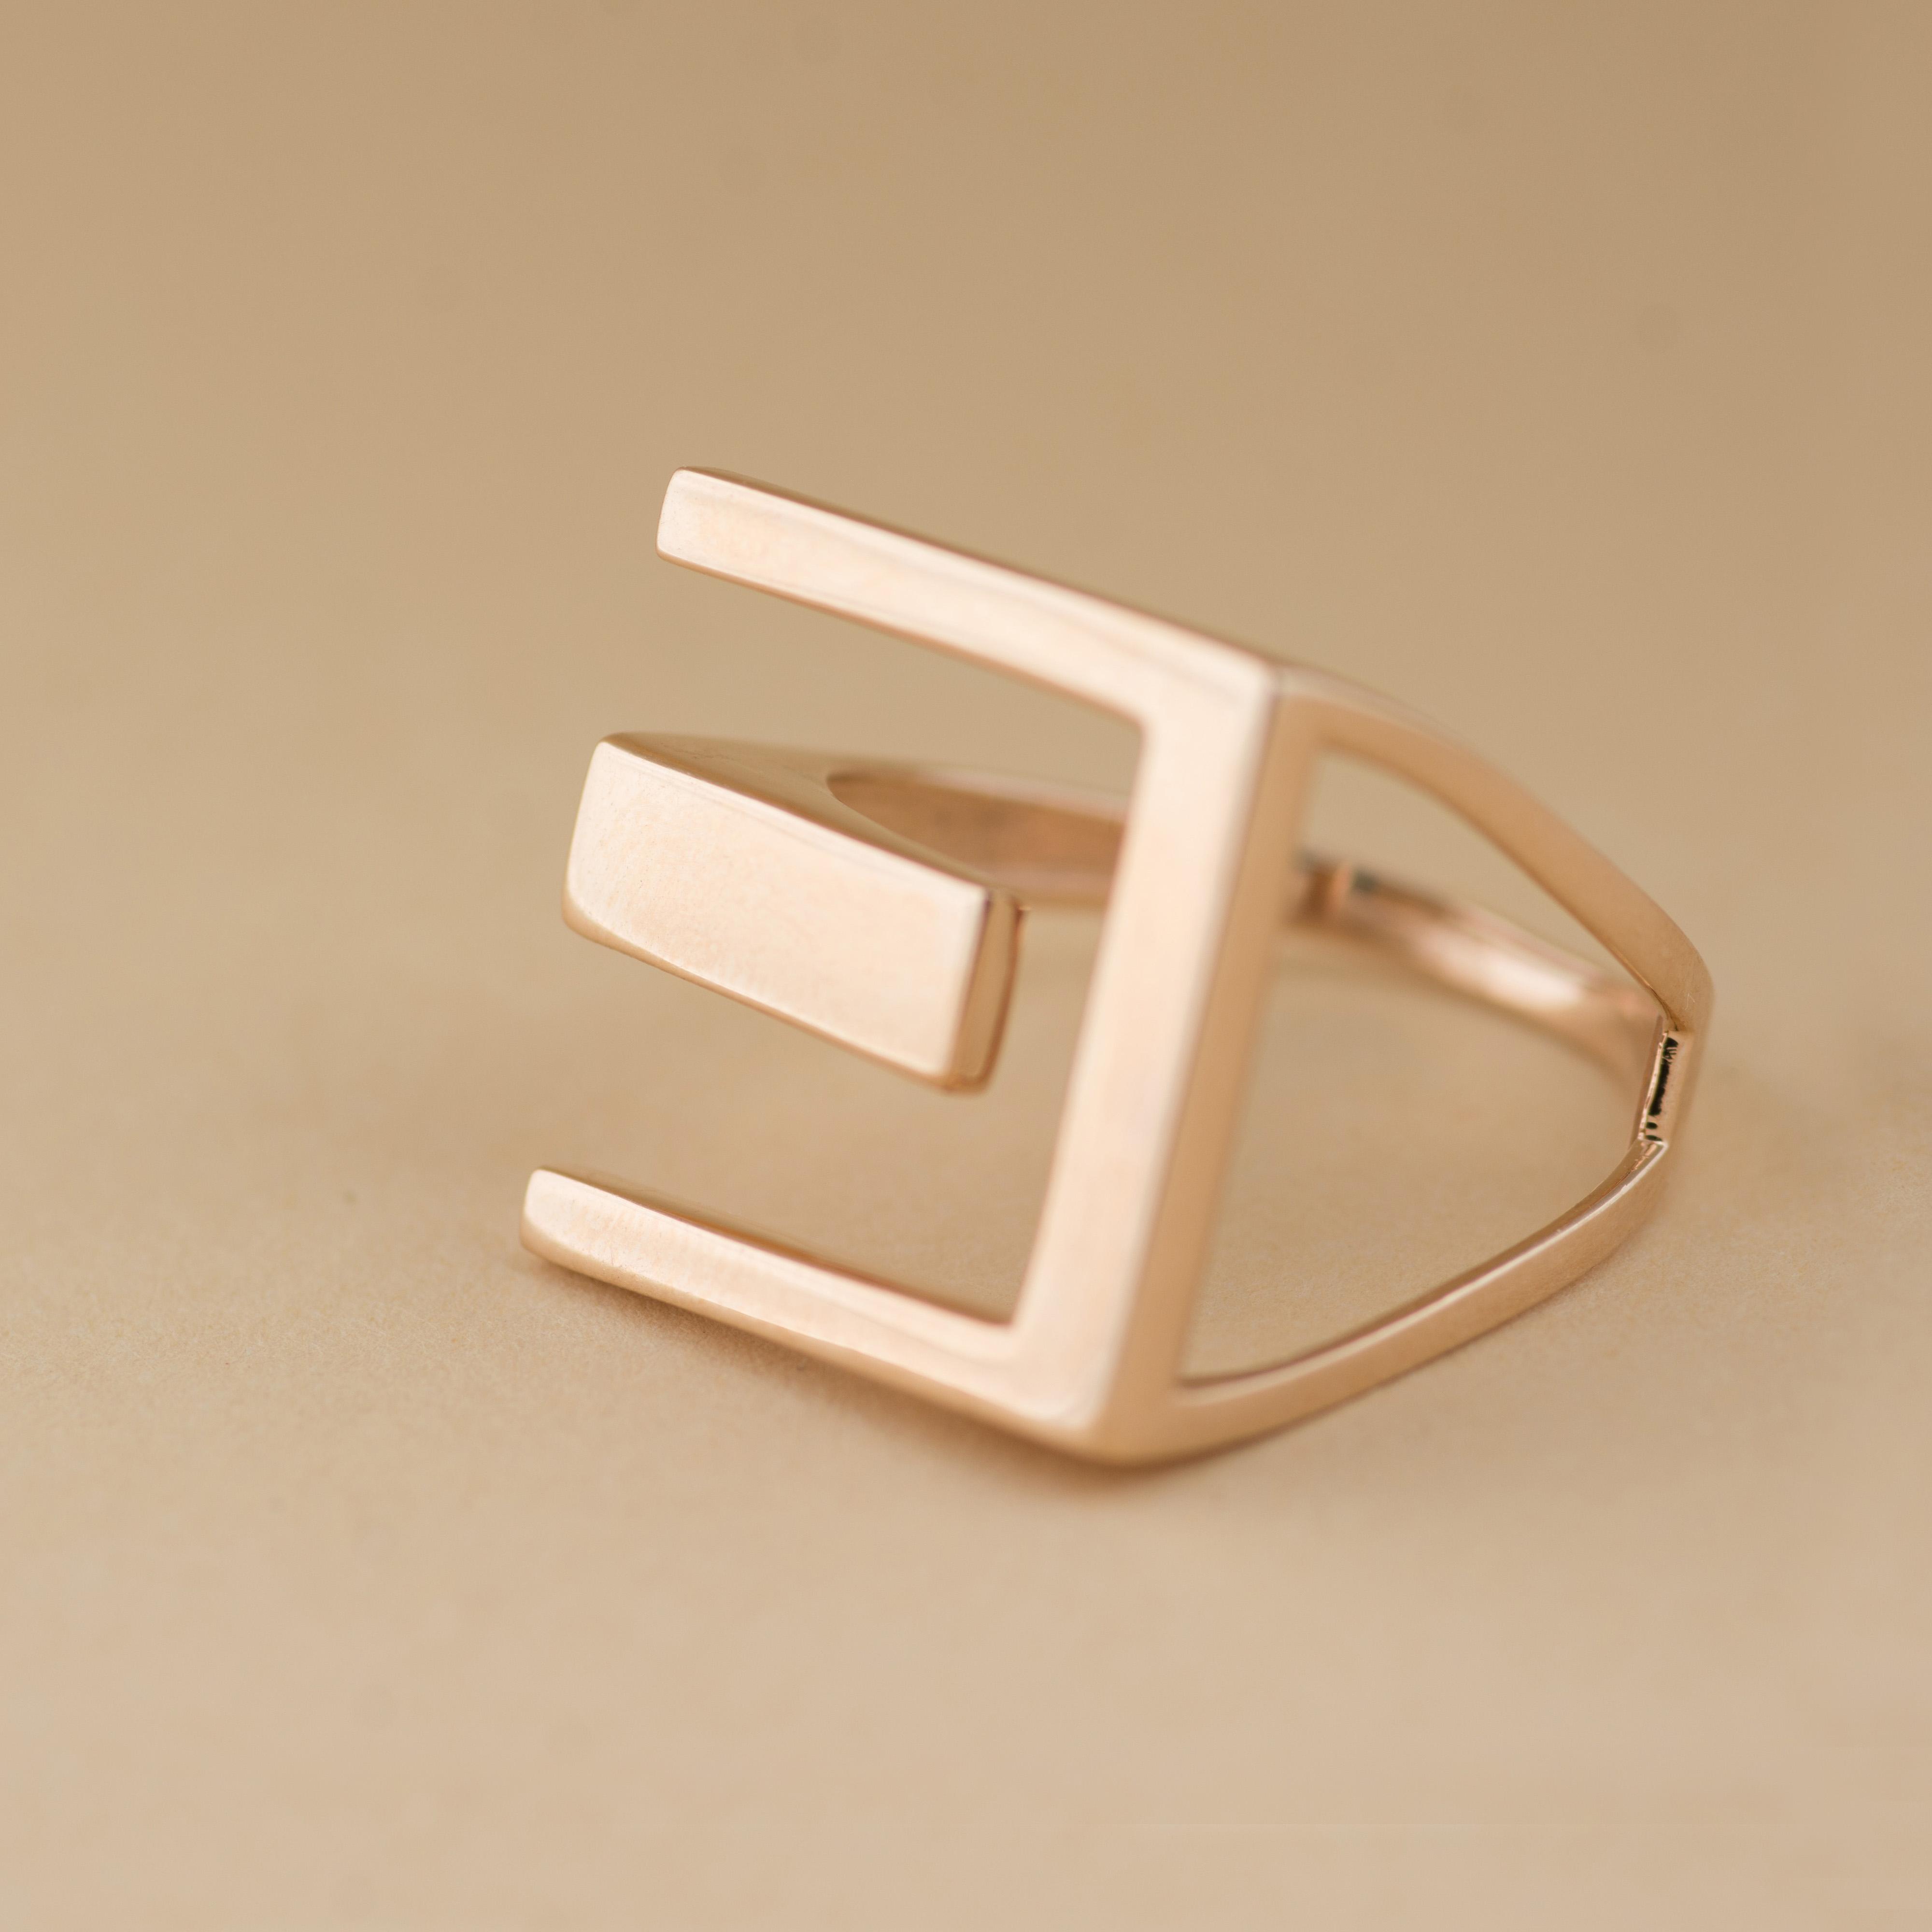 Золотое кольцо в стиле тиффани